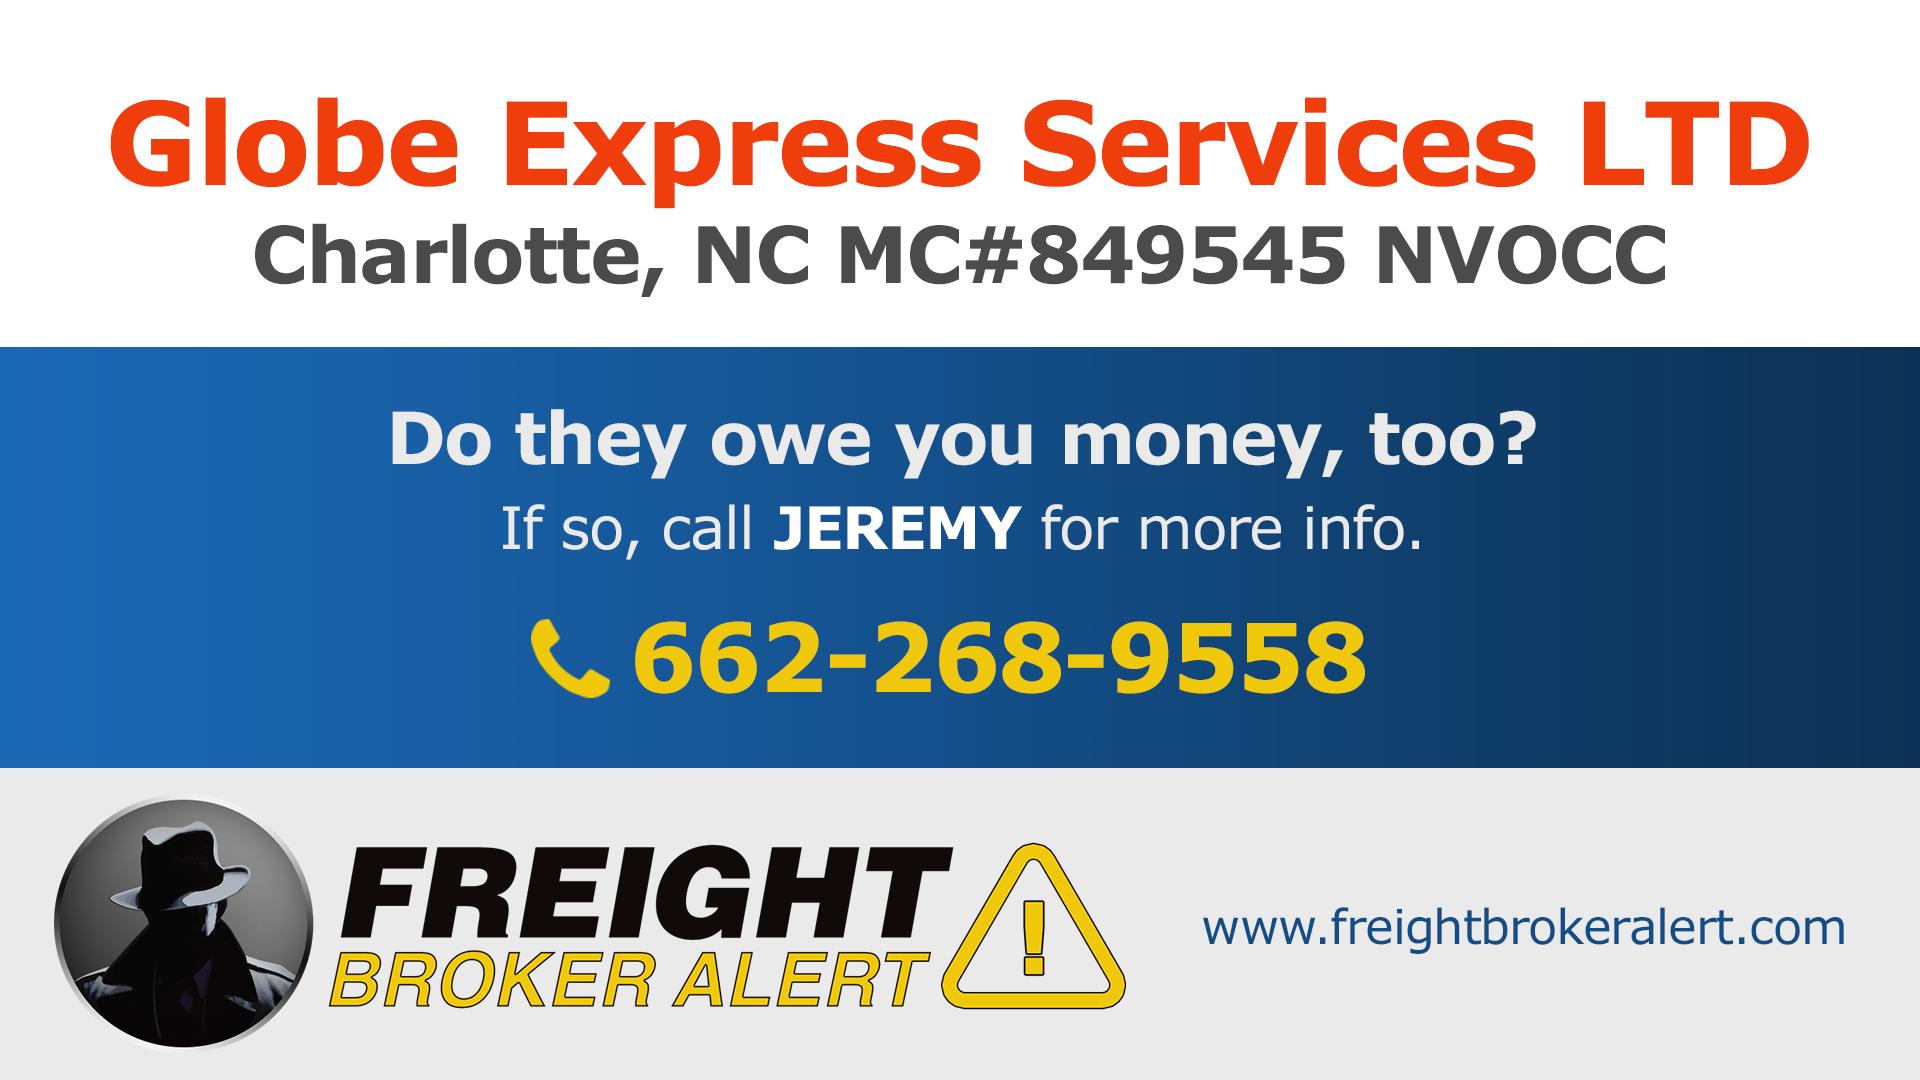 Globe Express Services LTD North Carolina